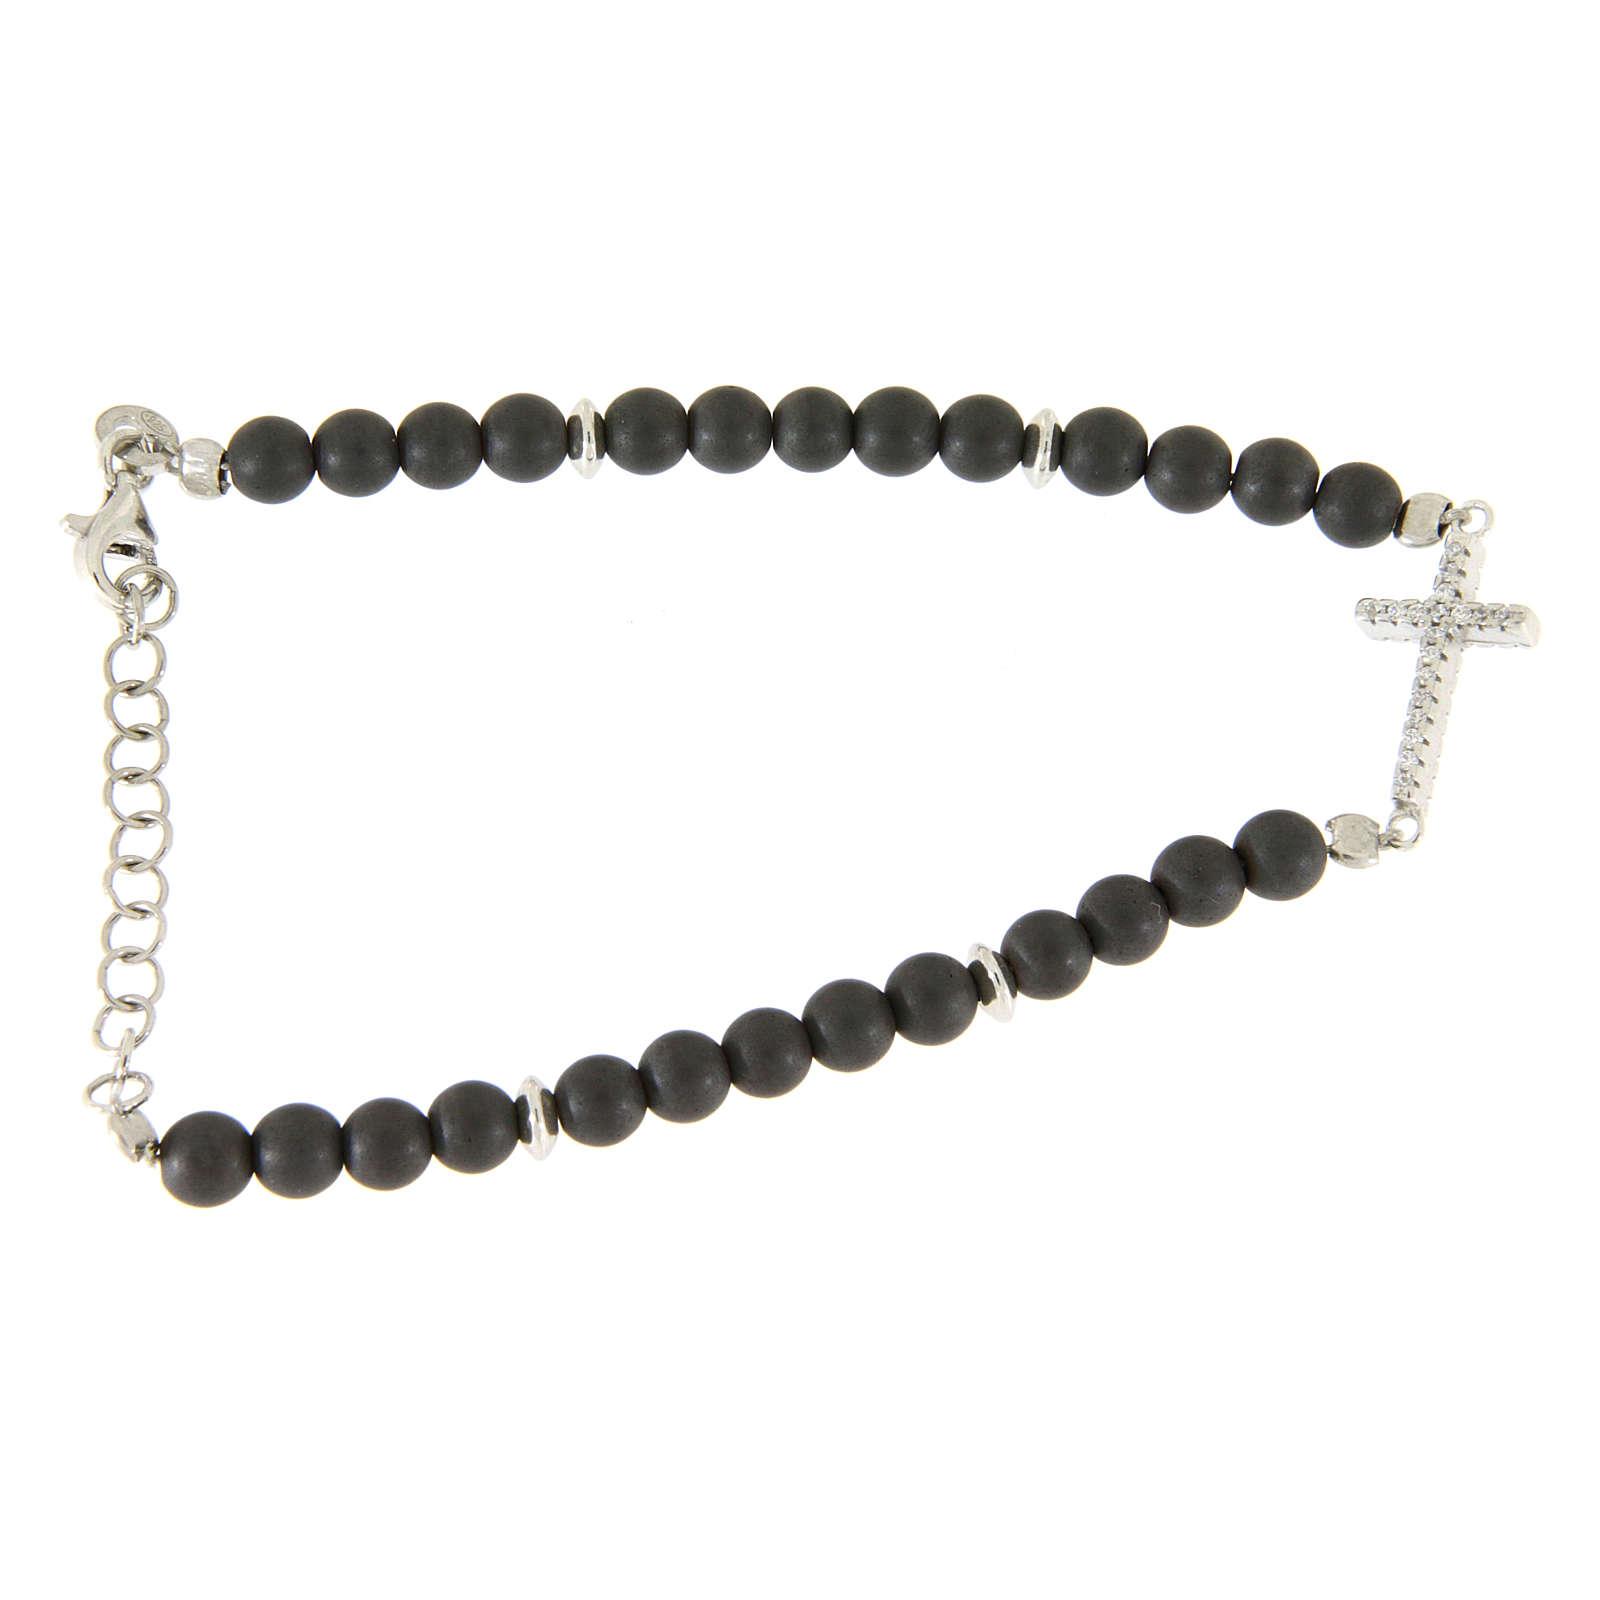 Bracelet in 925 sterling silver, hematite opaque balls and white zirconate cross 4